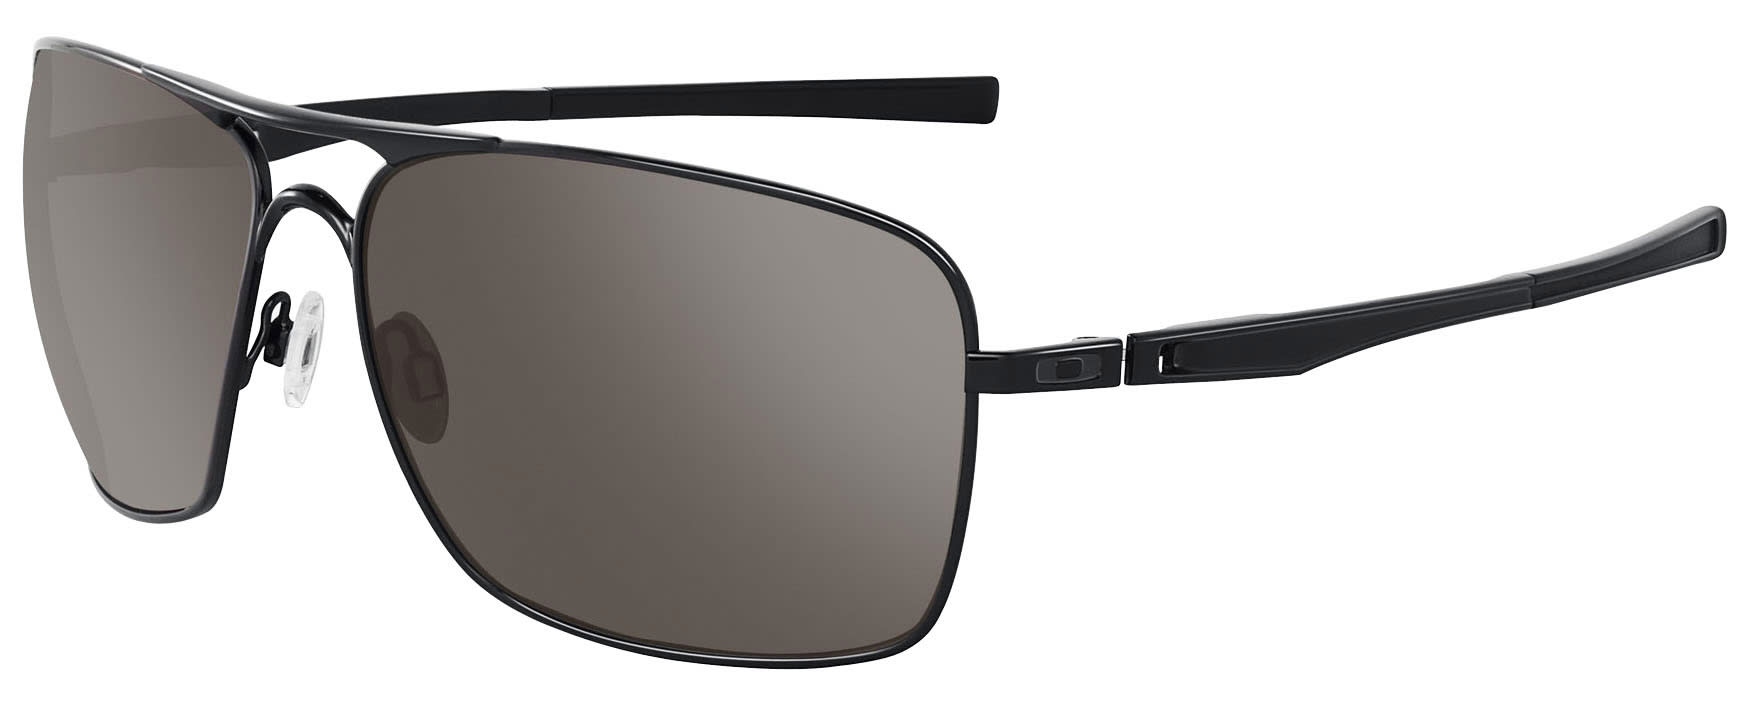 581570aeb1 Oakley Plaintiff Squared Sunglasses - thumbnail 1